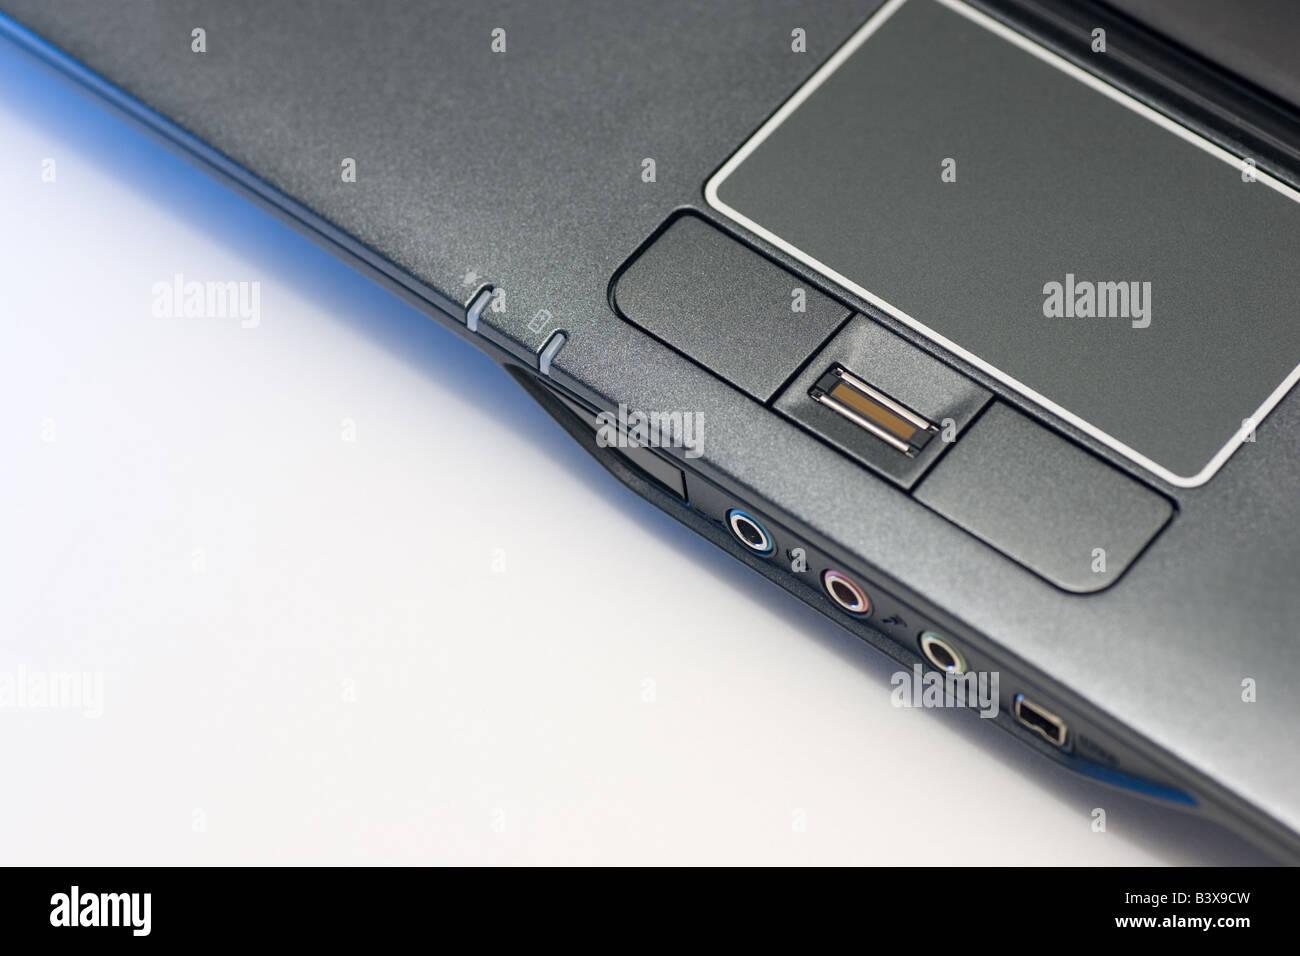 Touchpad portátiles con lector de huellas dactilares. Imagen De Stock